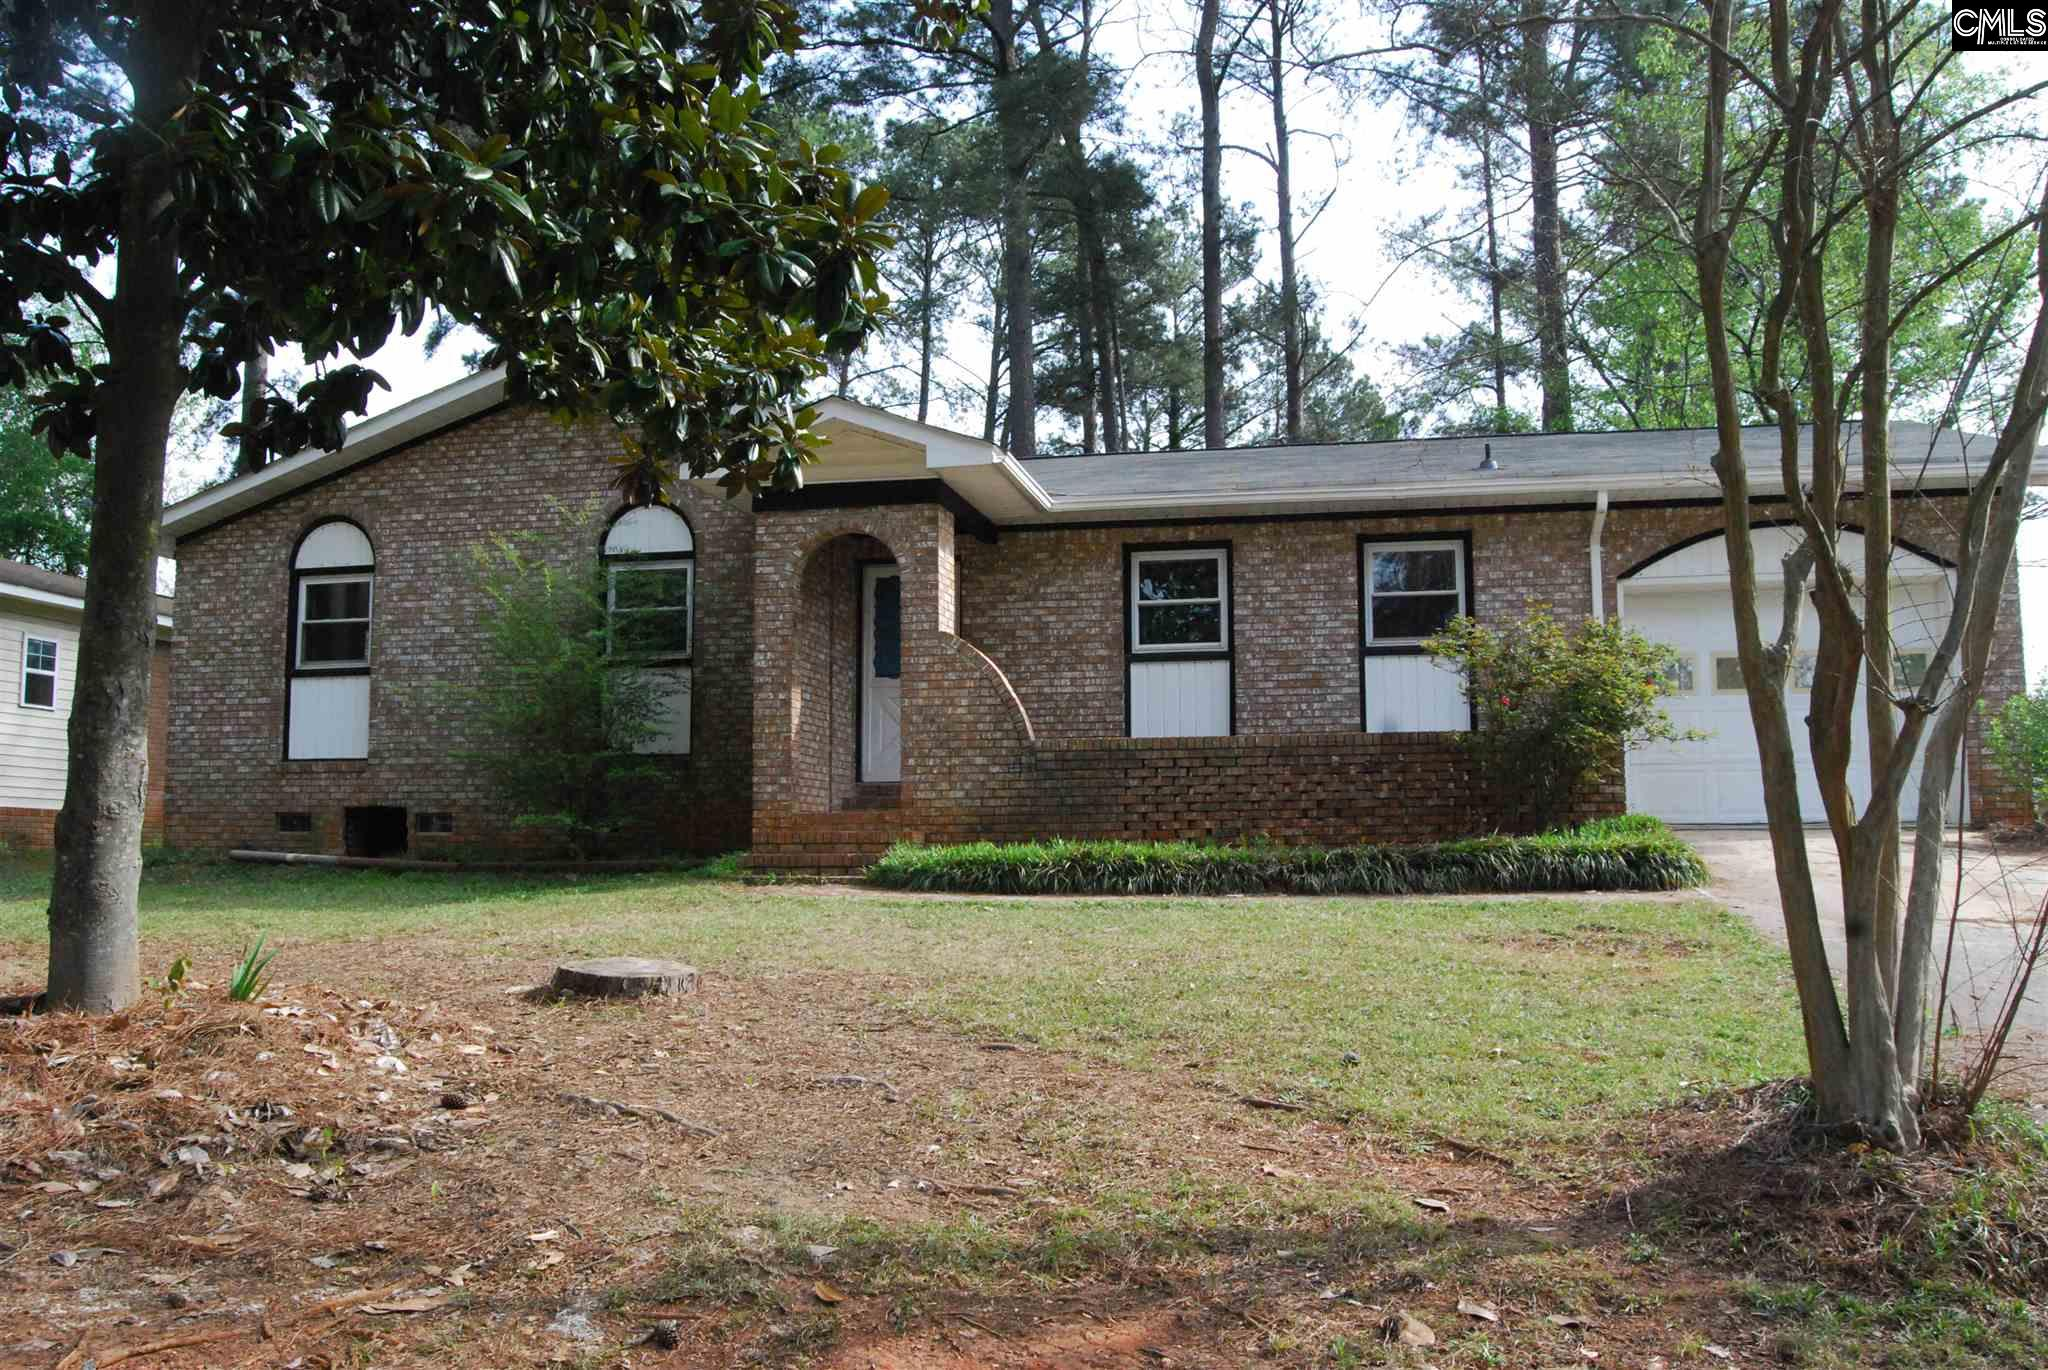 MLS 244 Stirlington Columbia South Carolina for $115 000